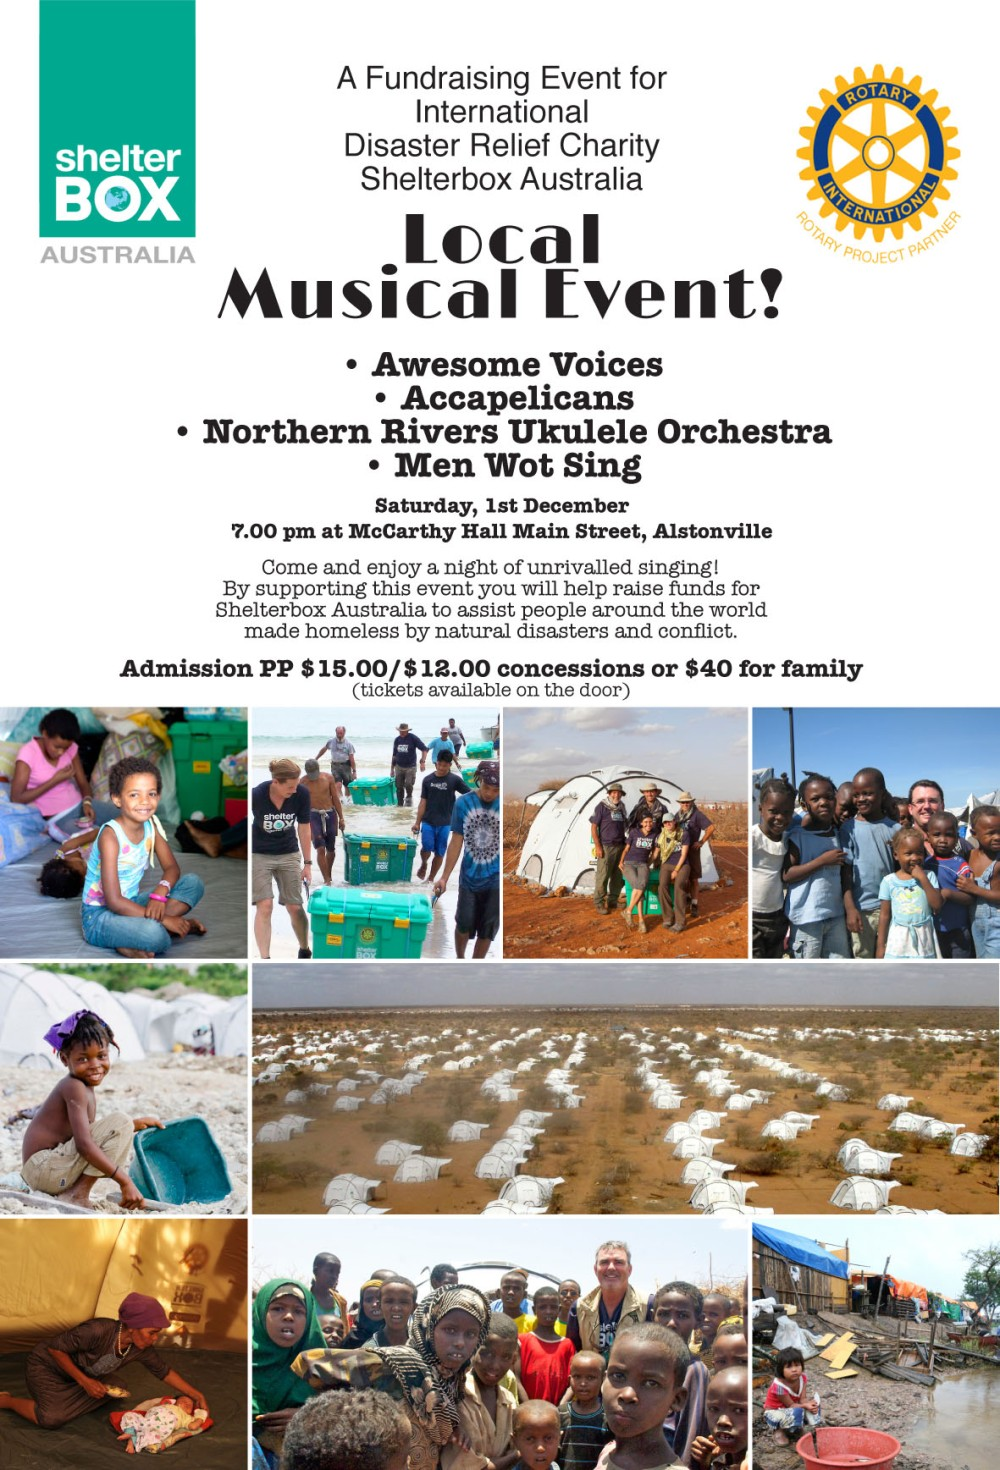 Poster for fundraising concert in Alstonville on 1st December